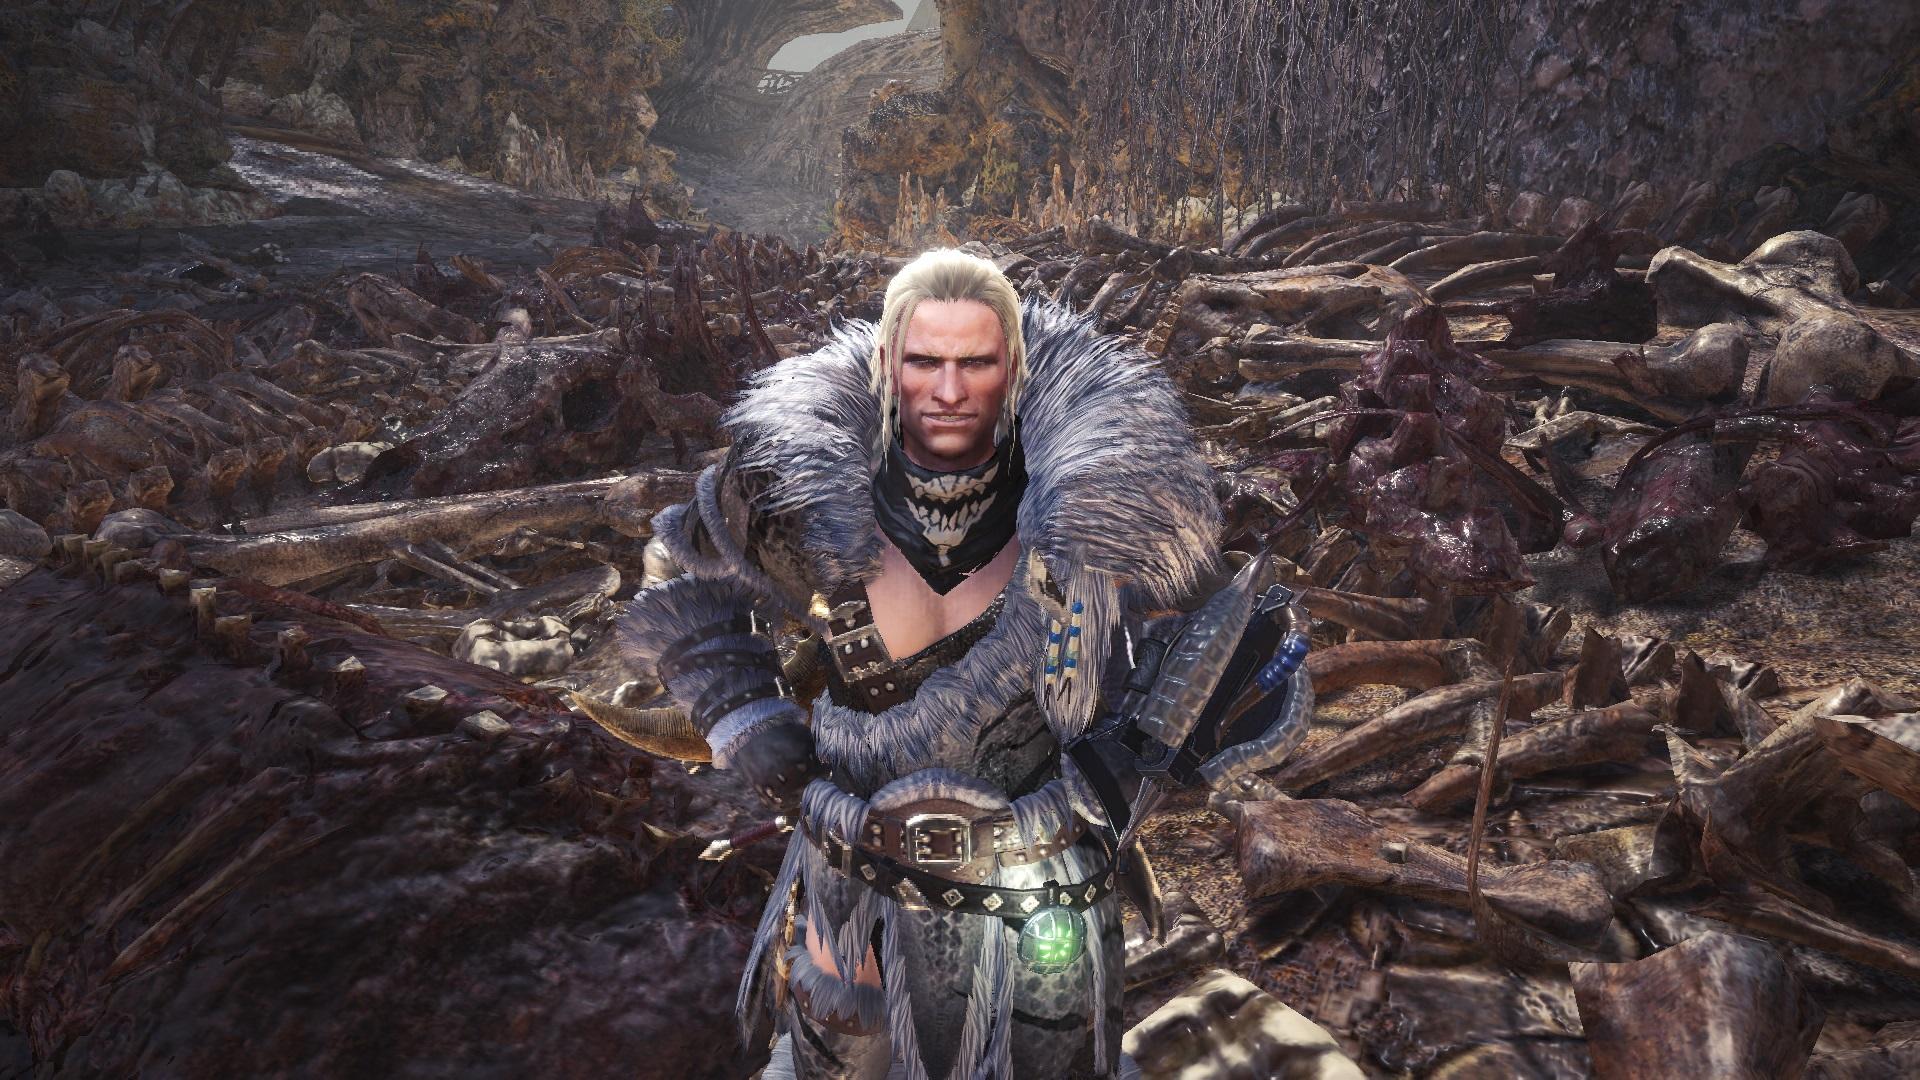 skull scarf layered armor